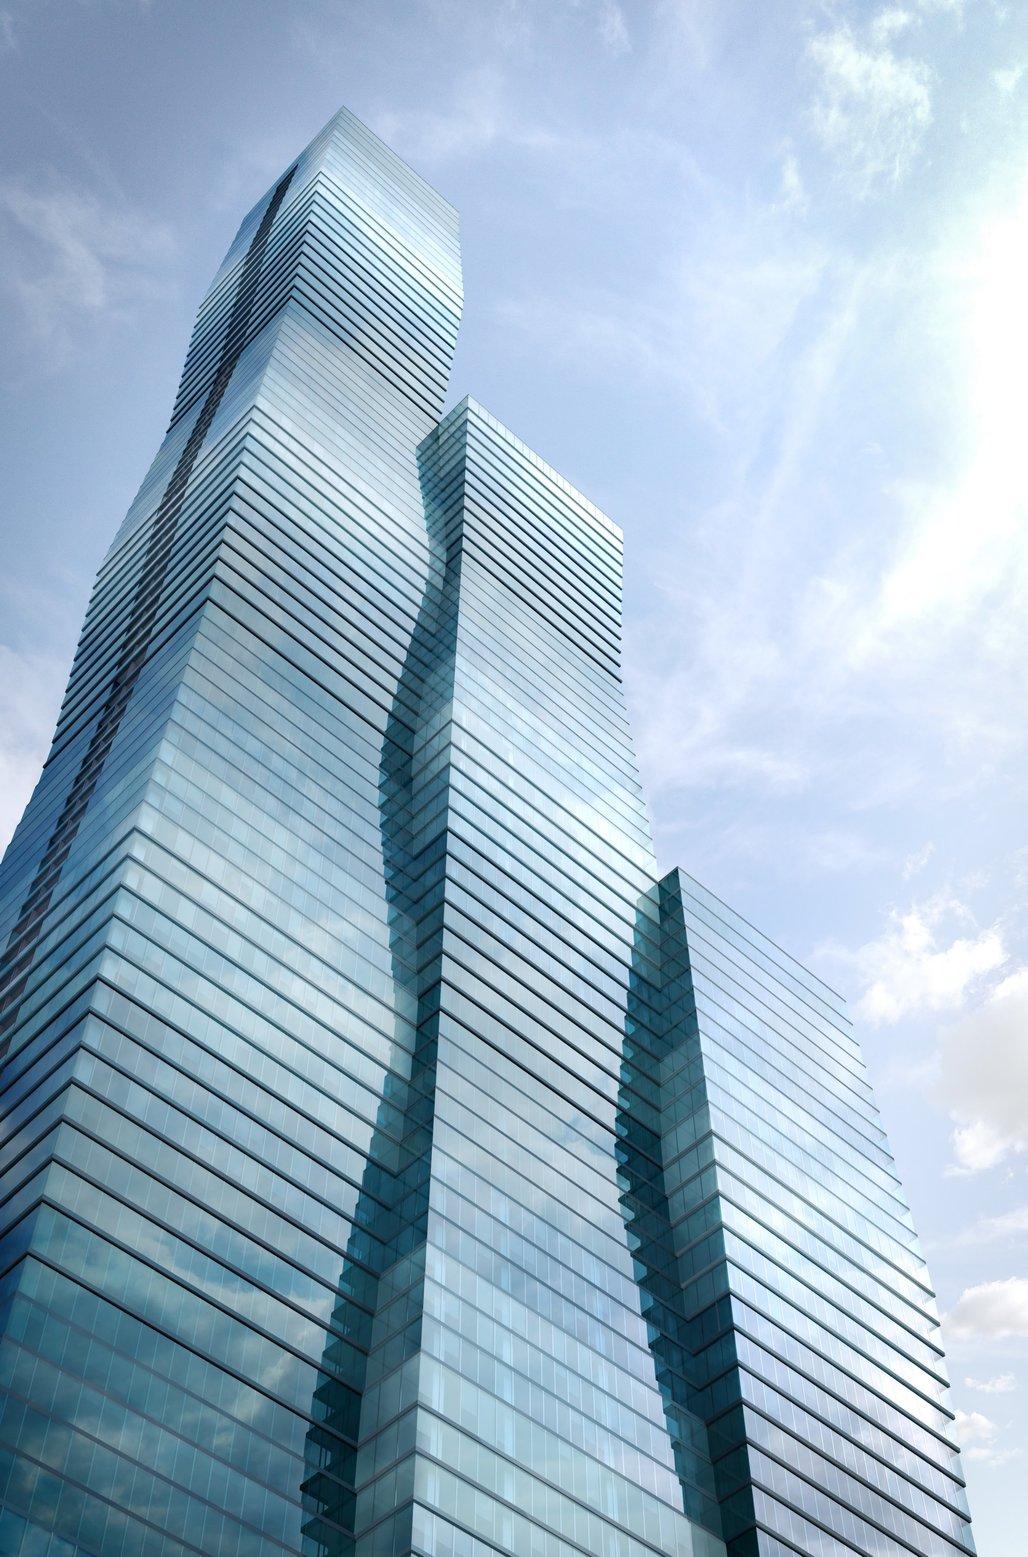 Vista Tower Image courtesy of Magellan Development Group